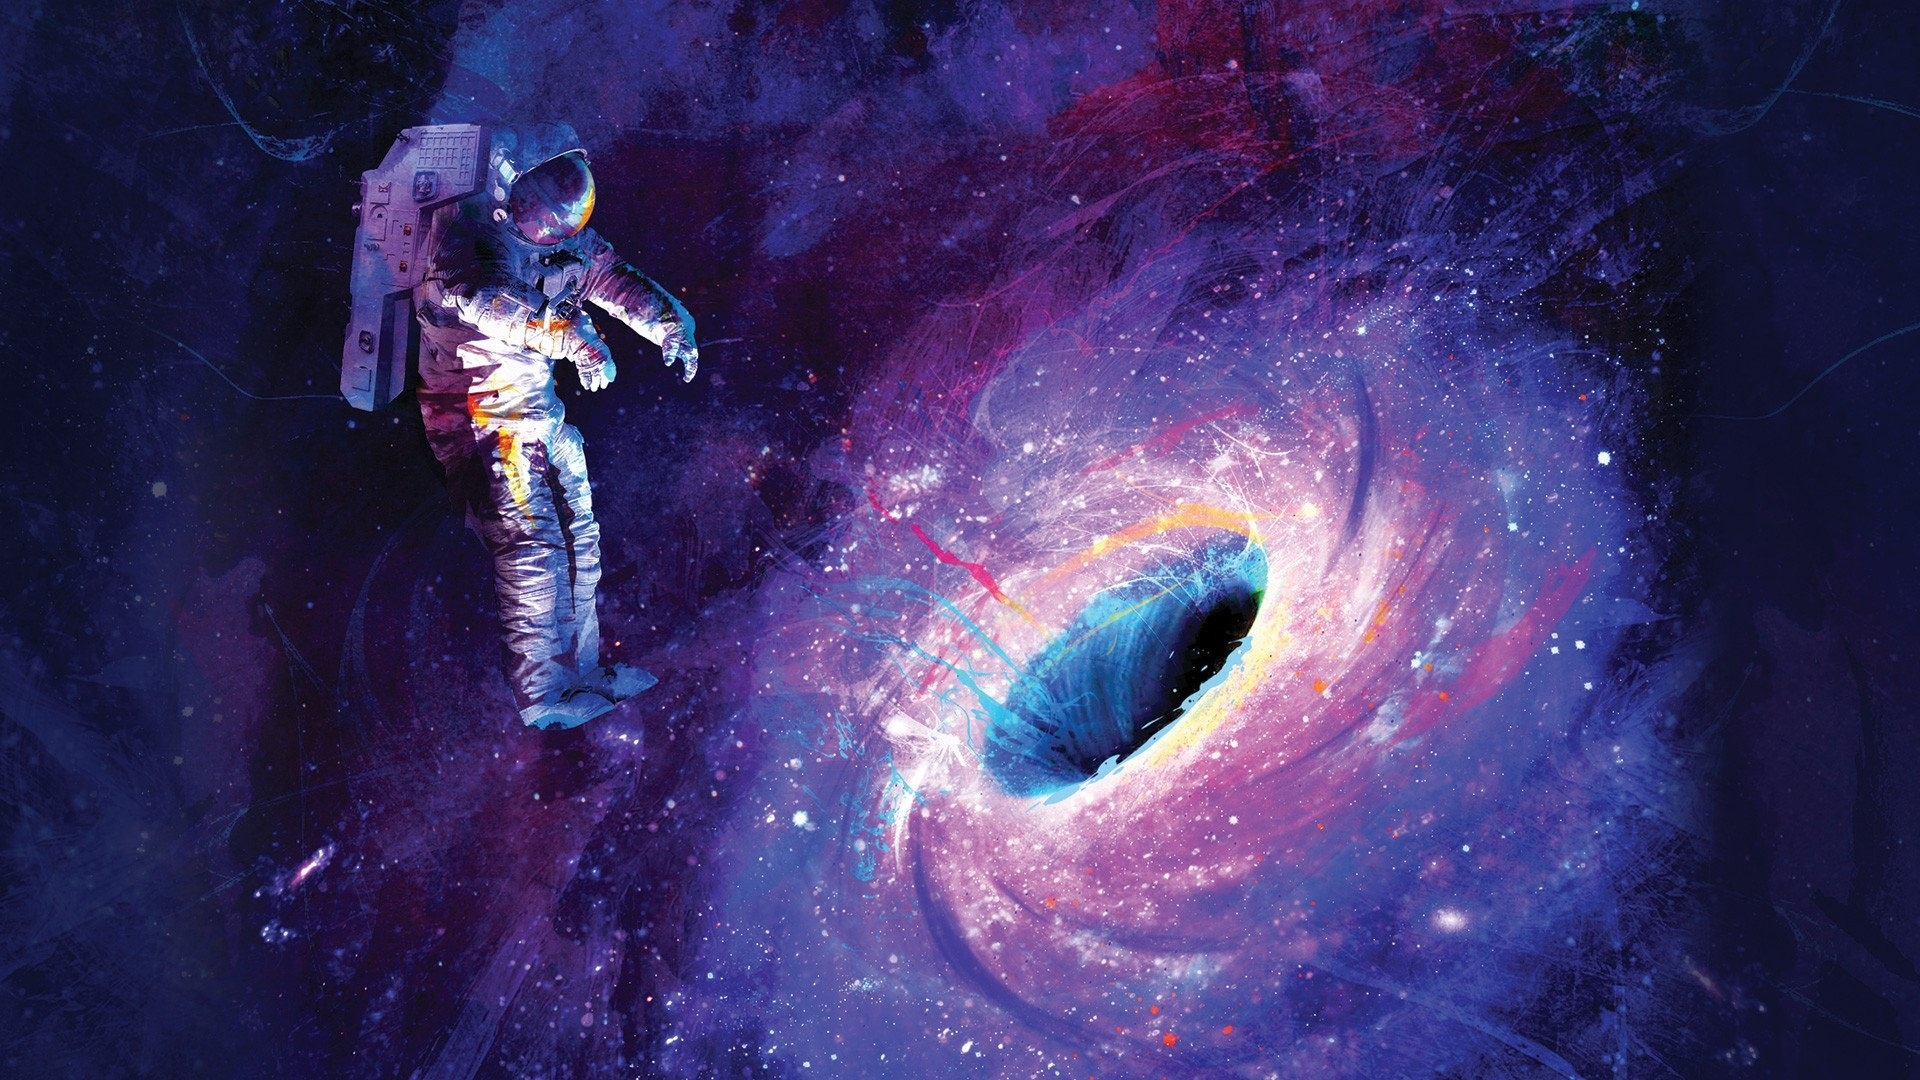 Astronaut Art Image